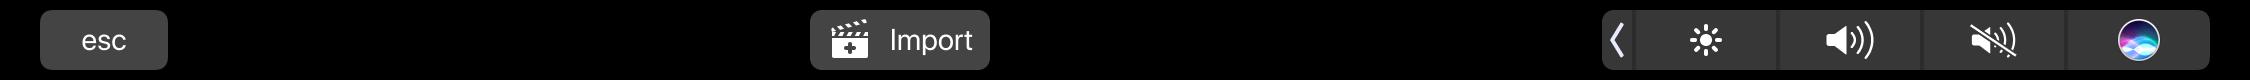 touchbar-import